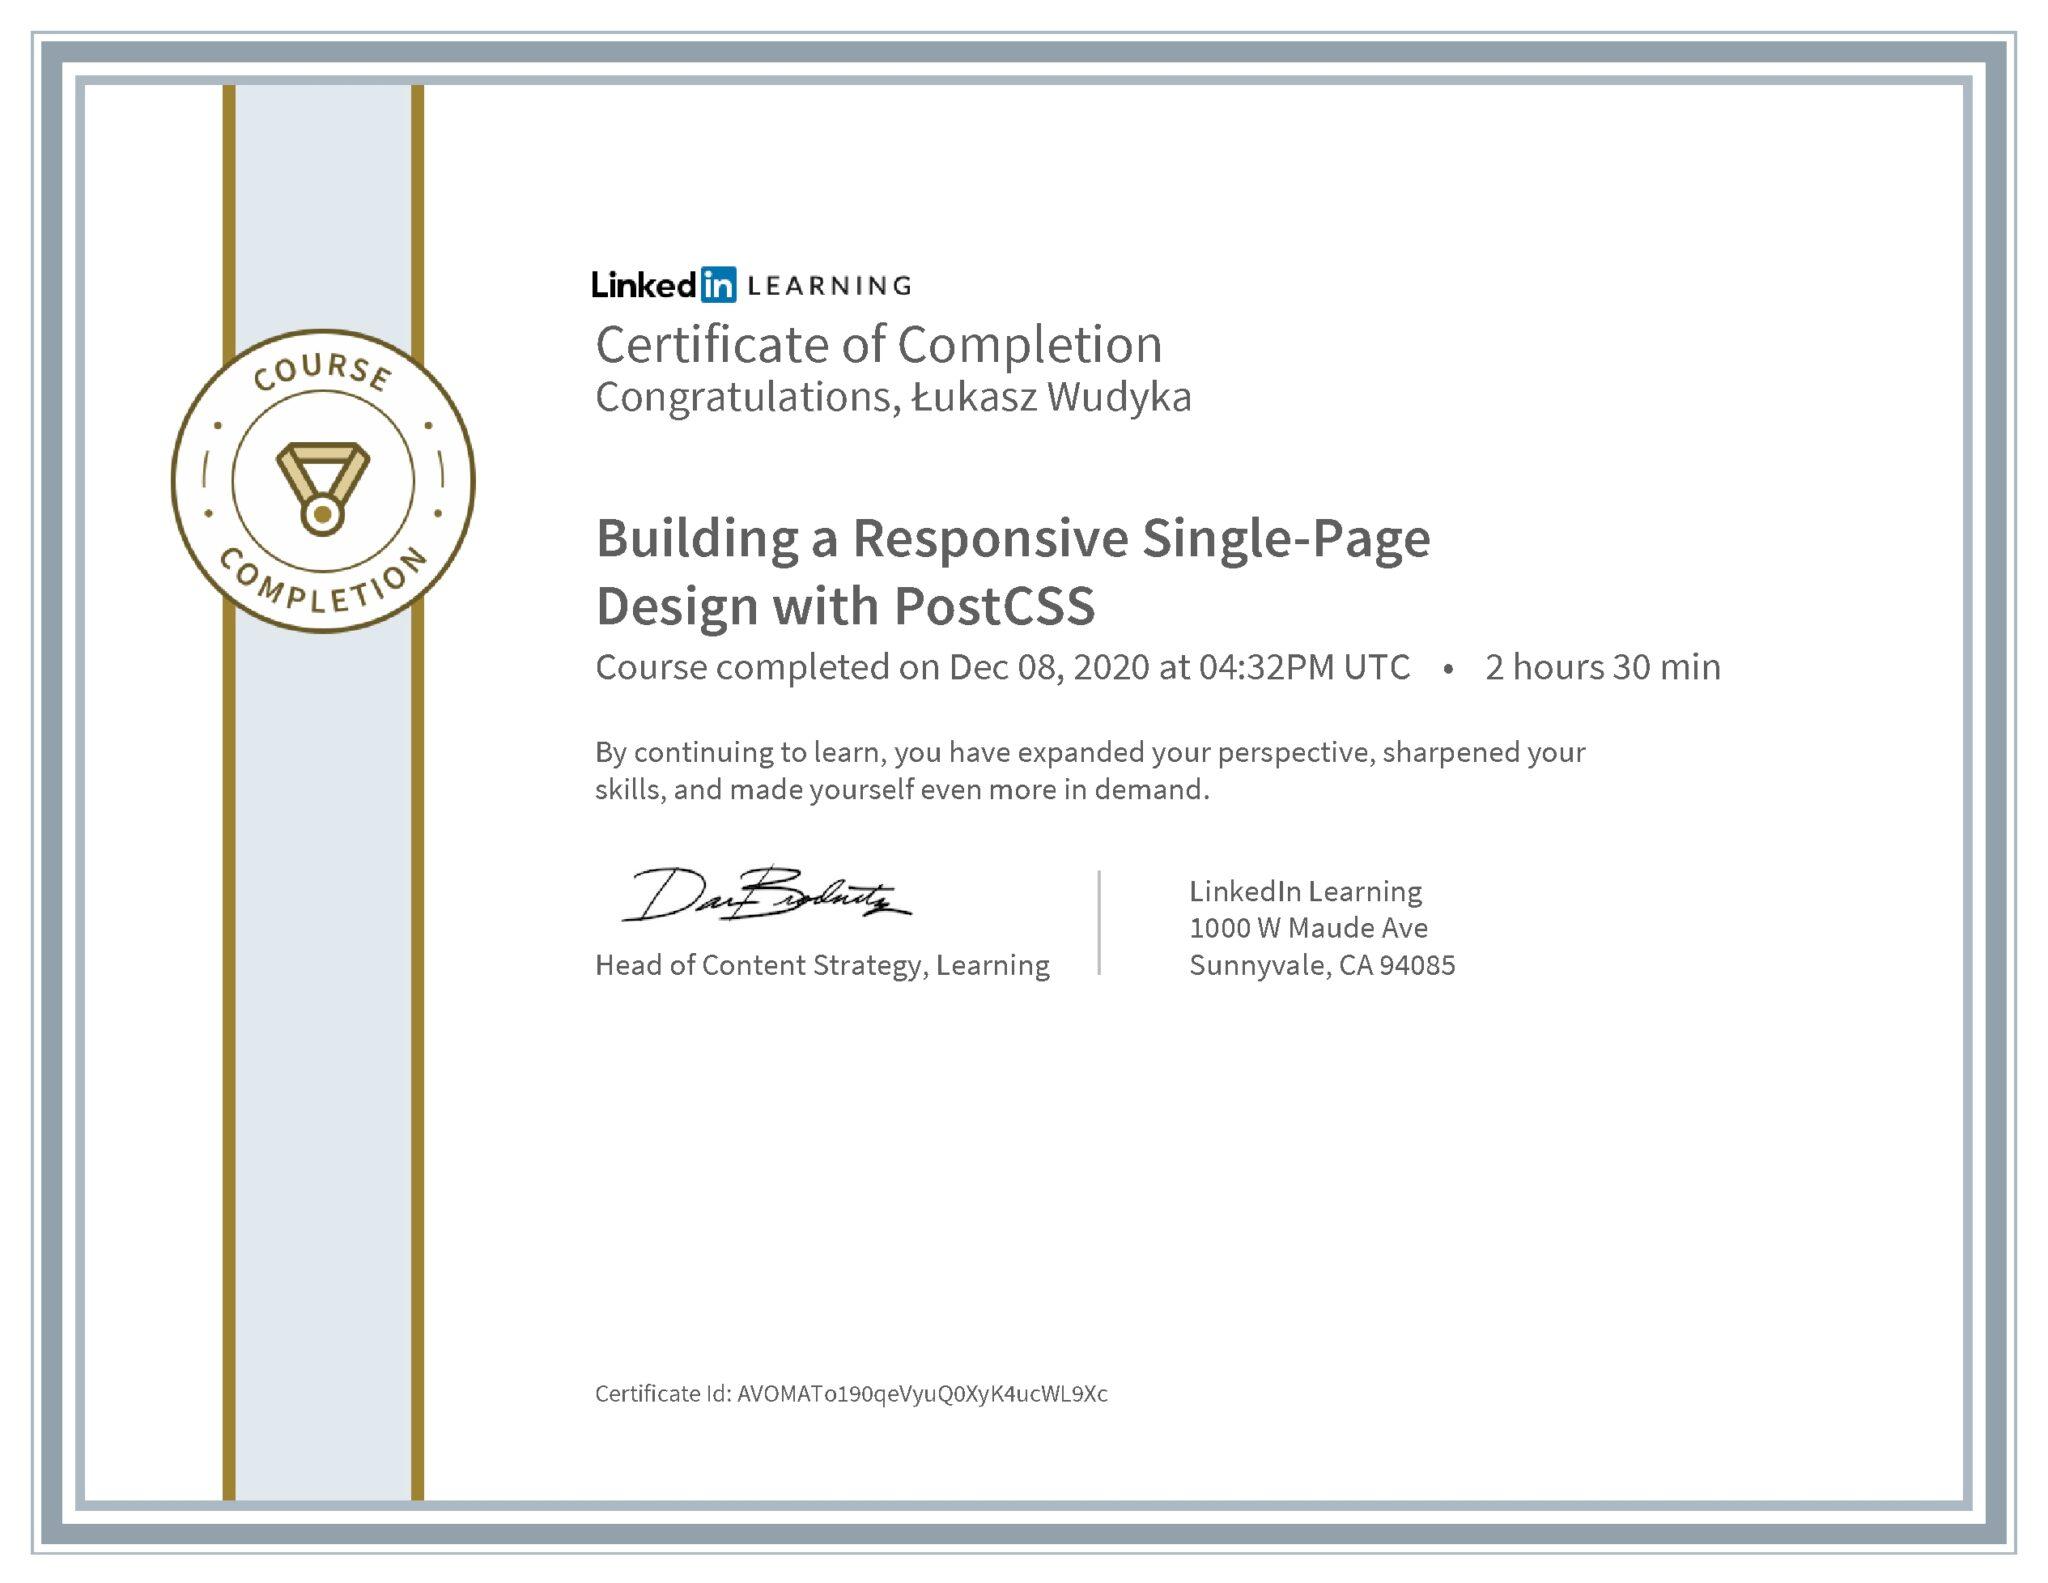 Łukasz Wudyka certyfikat LinkedIn Building a Responsive Single-Page Design with PostCSS